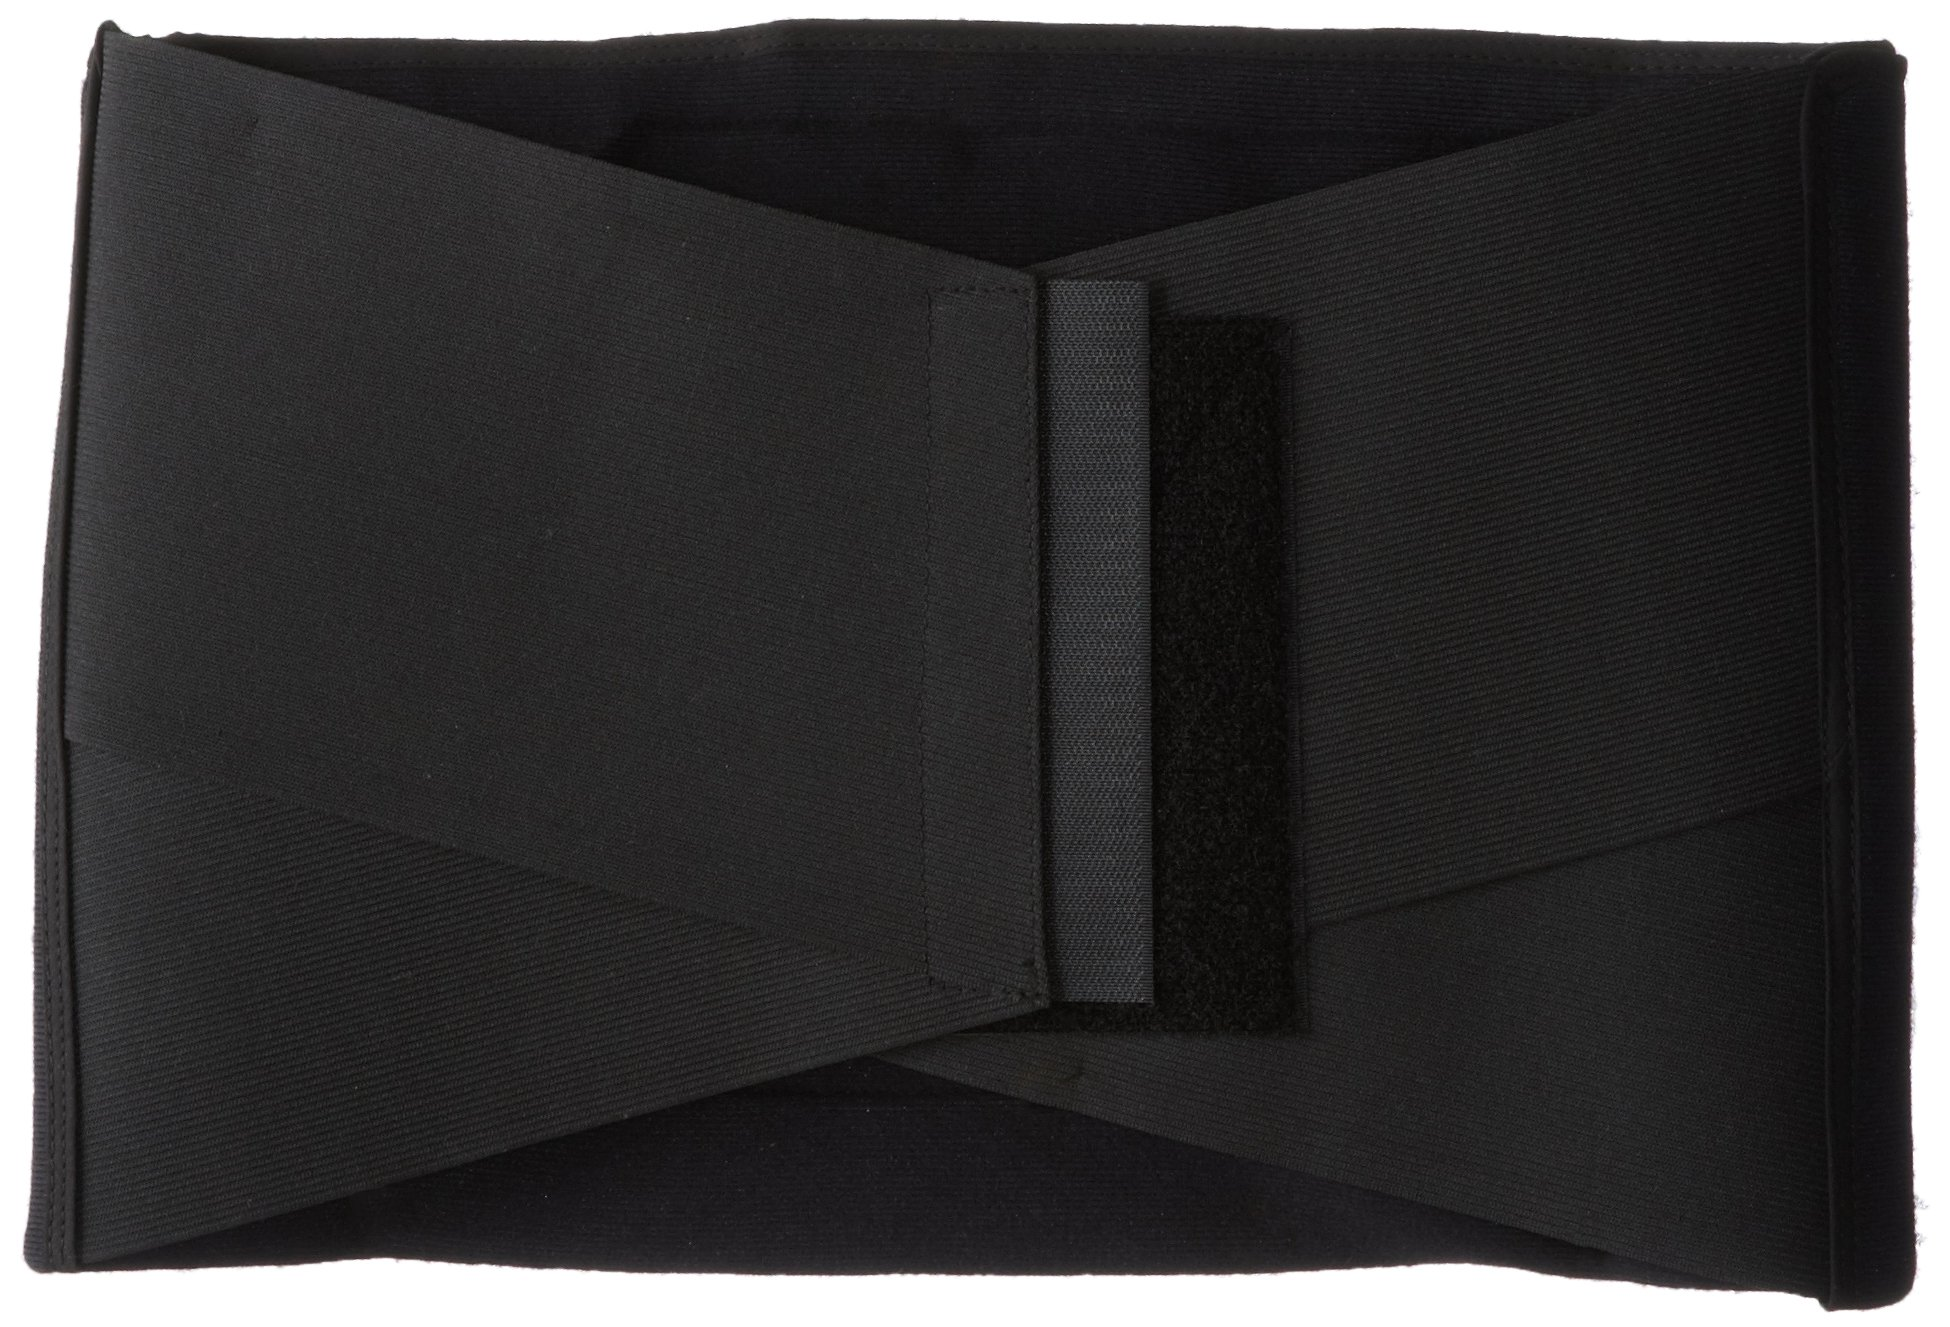 Bilt-Rite Mastex Health LSO Body Jacket with APL Control, Black, Small